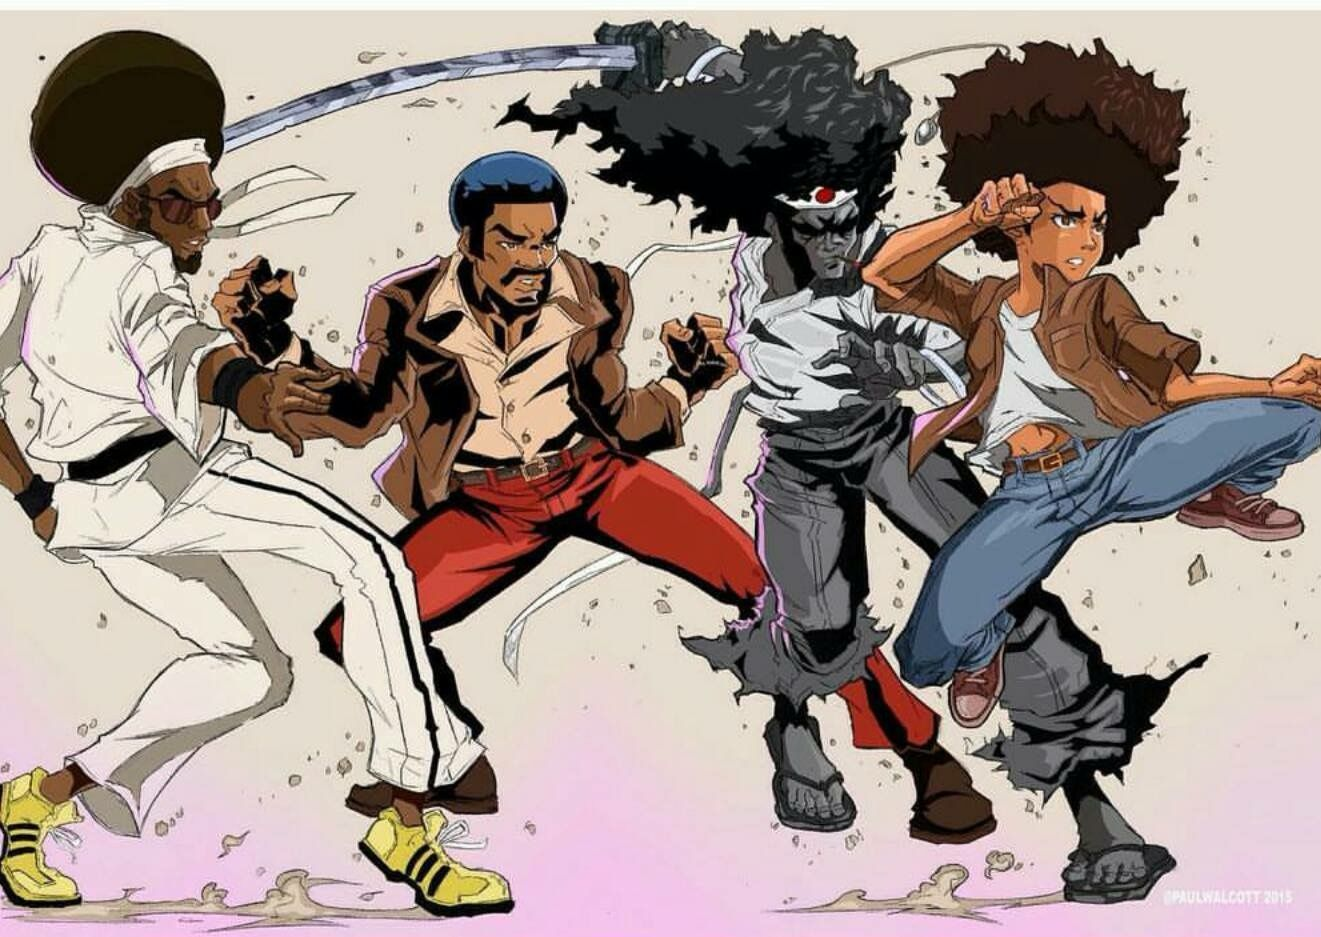 Pin By Cali Cal On Black Art Black Anime Characters Black